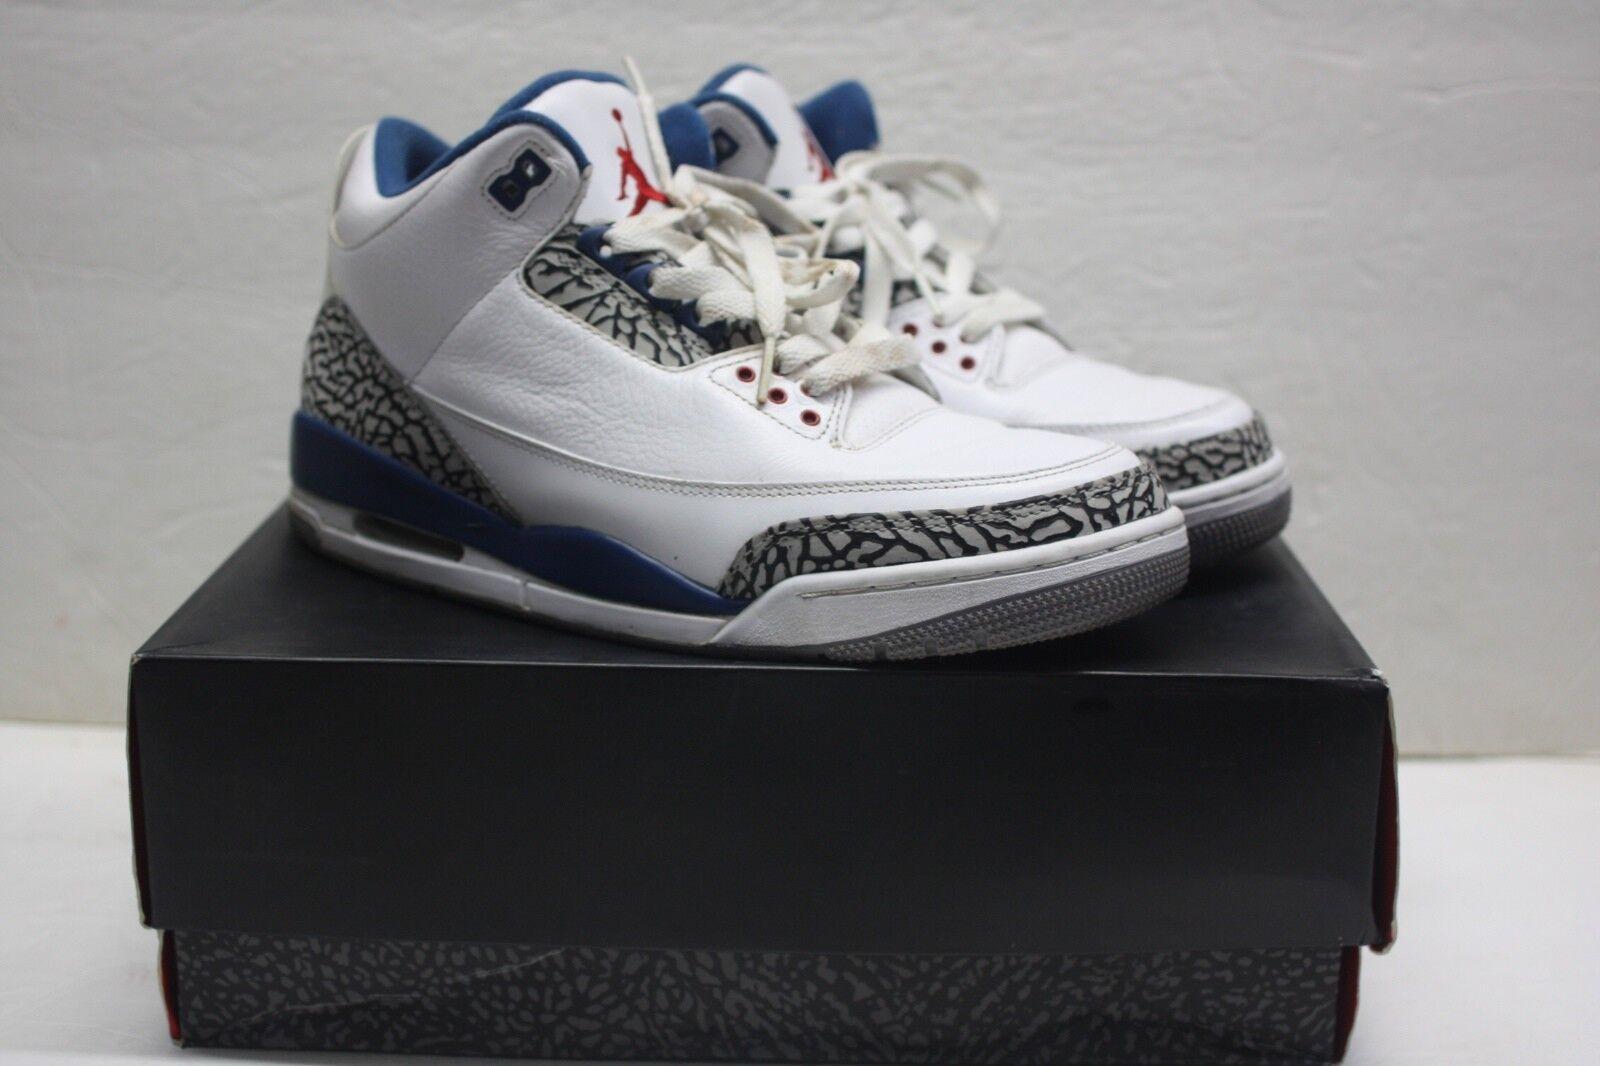 2011 Nike Air Jordan III 3 Retro True bluee 136064 104 White Cement Grey  Size 10